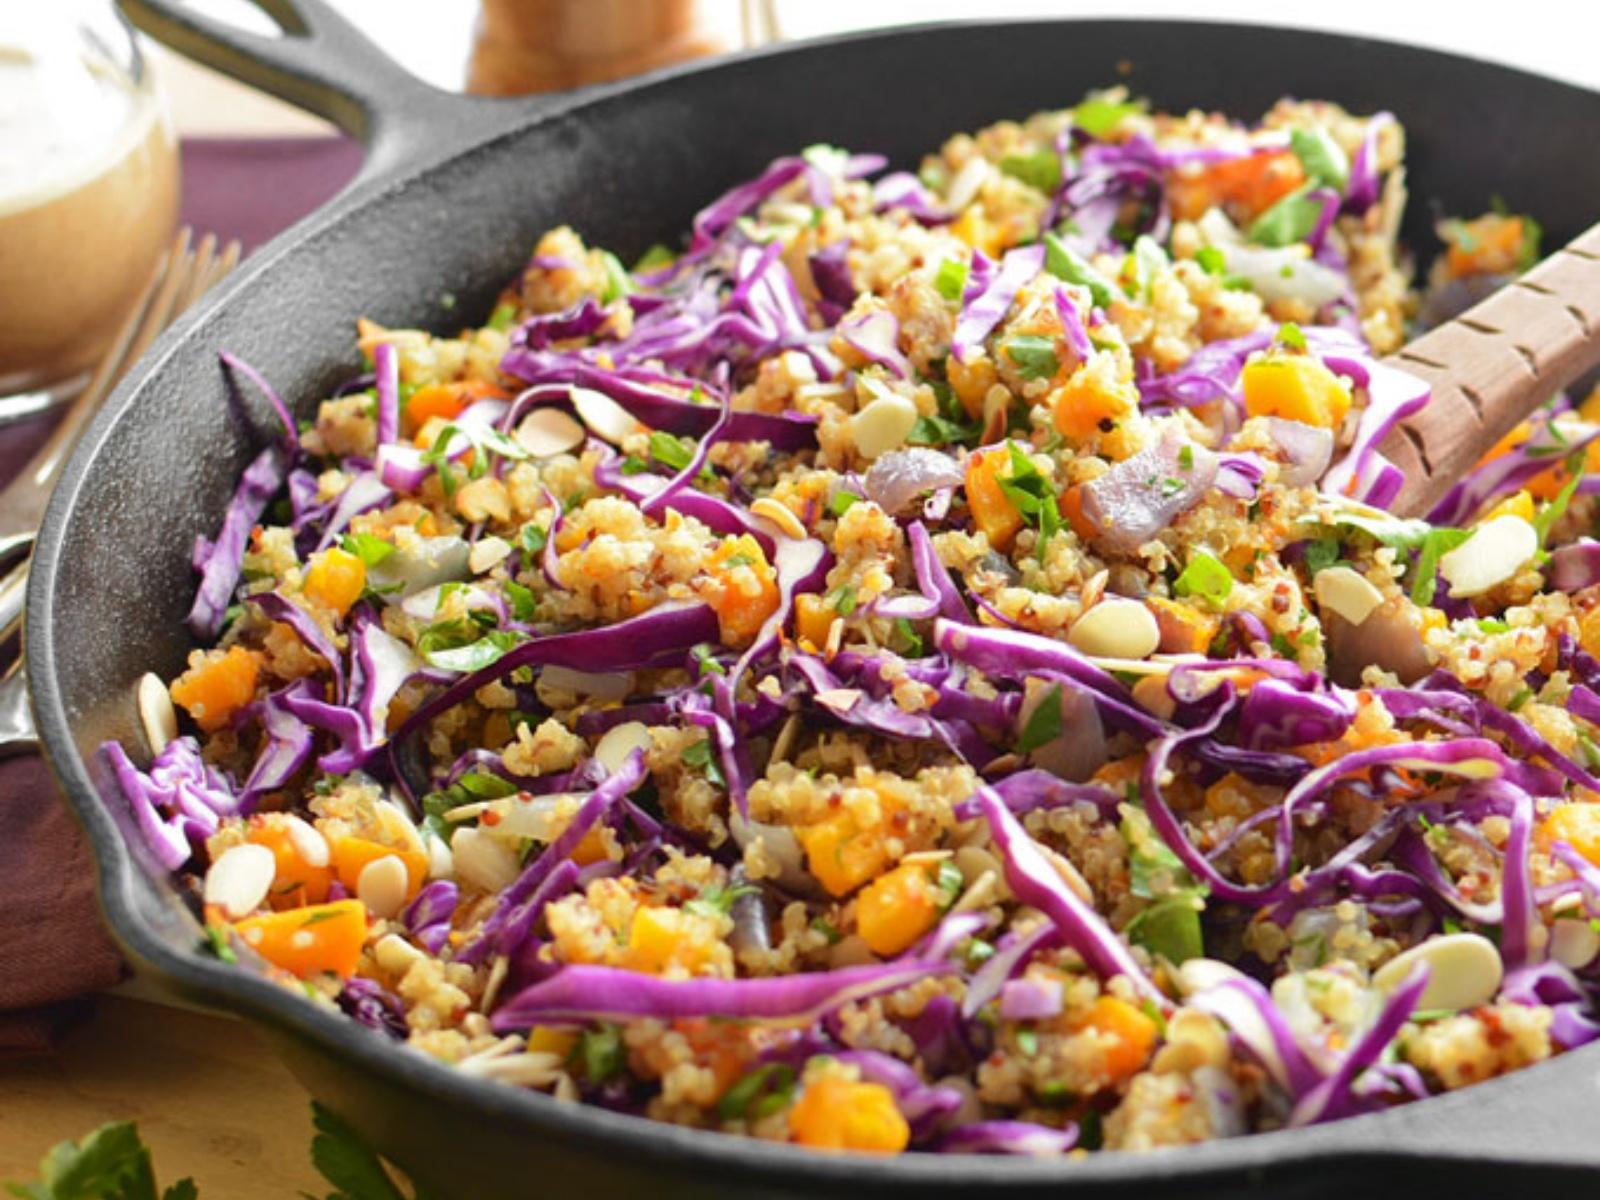 Warm Butternut Squash, Quinoa and Almond Salad